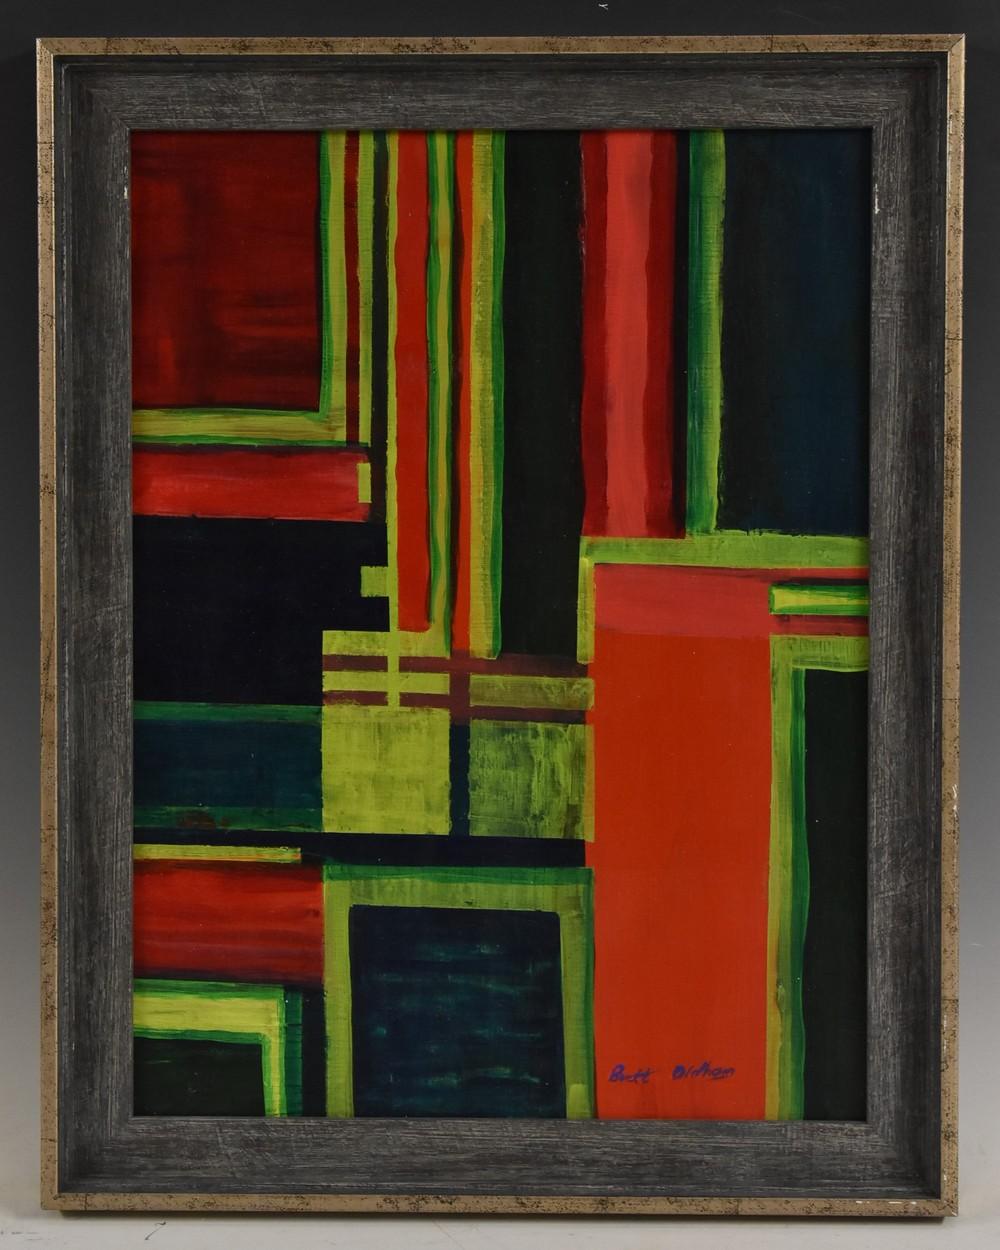 Lot 3032 - Brett Oldham (Modern British School) Art Concrete, Red, Yellow, Green, signed, oil on board,